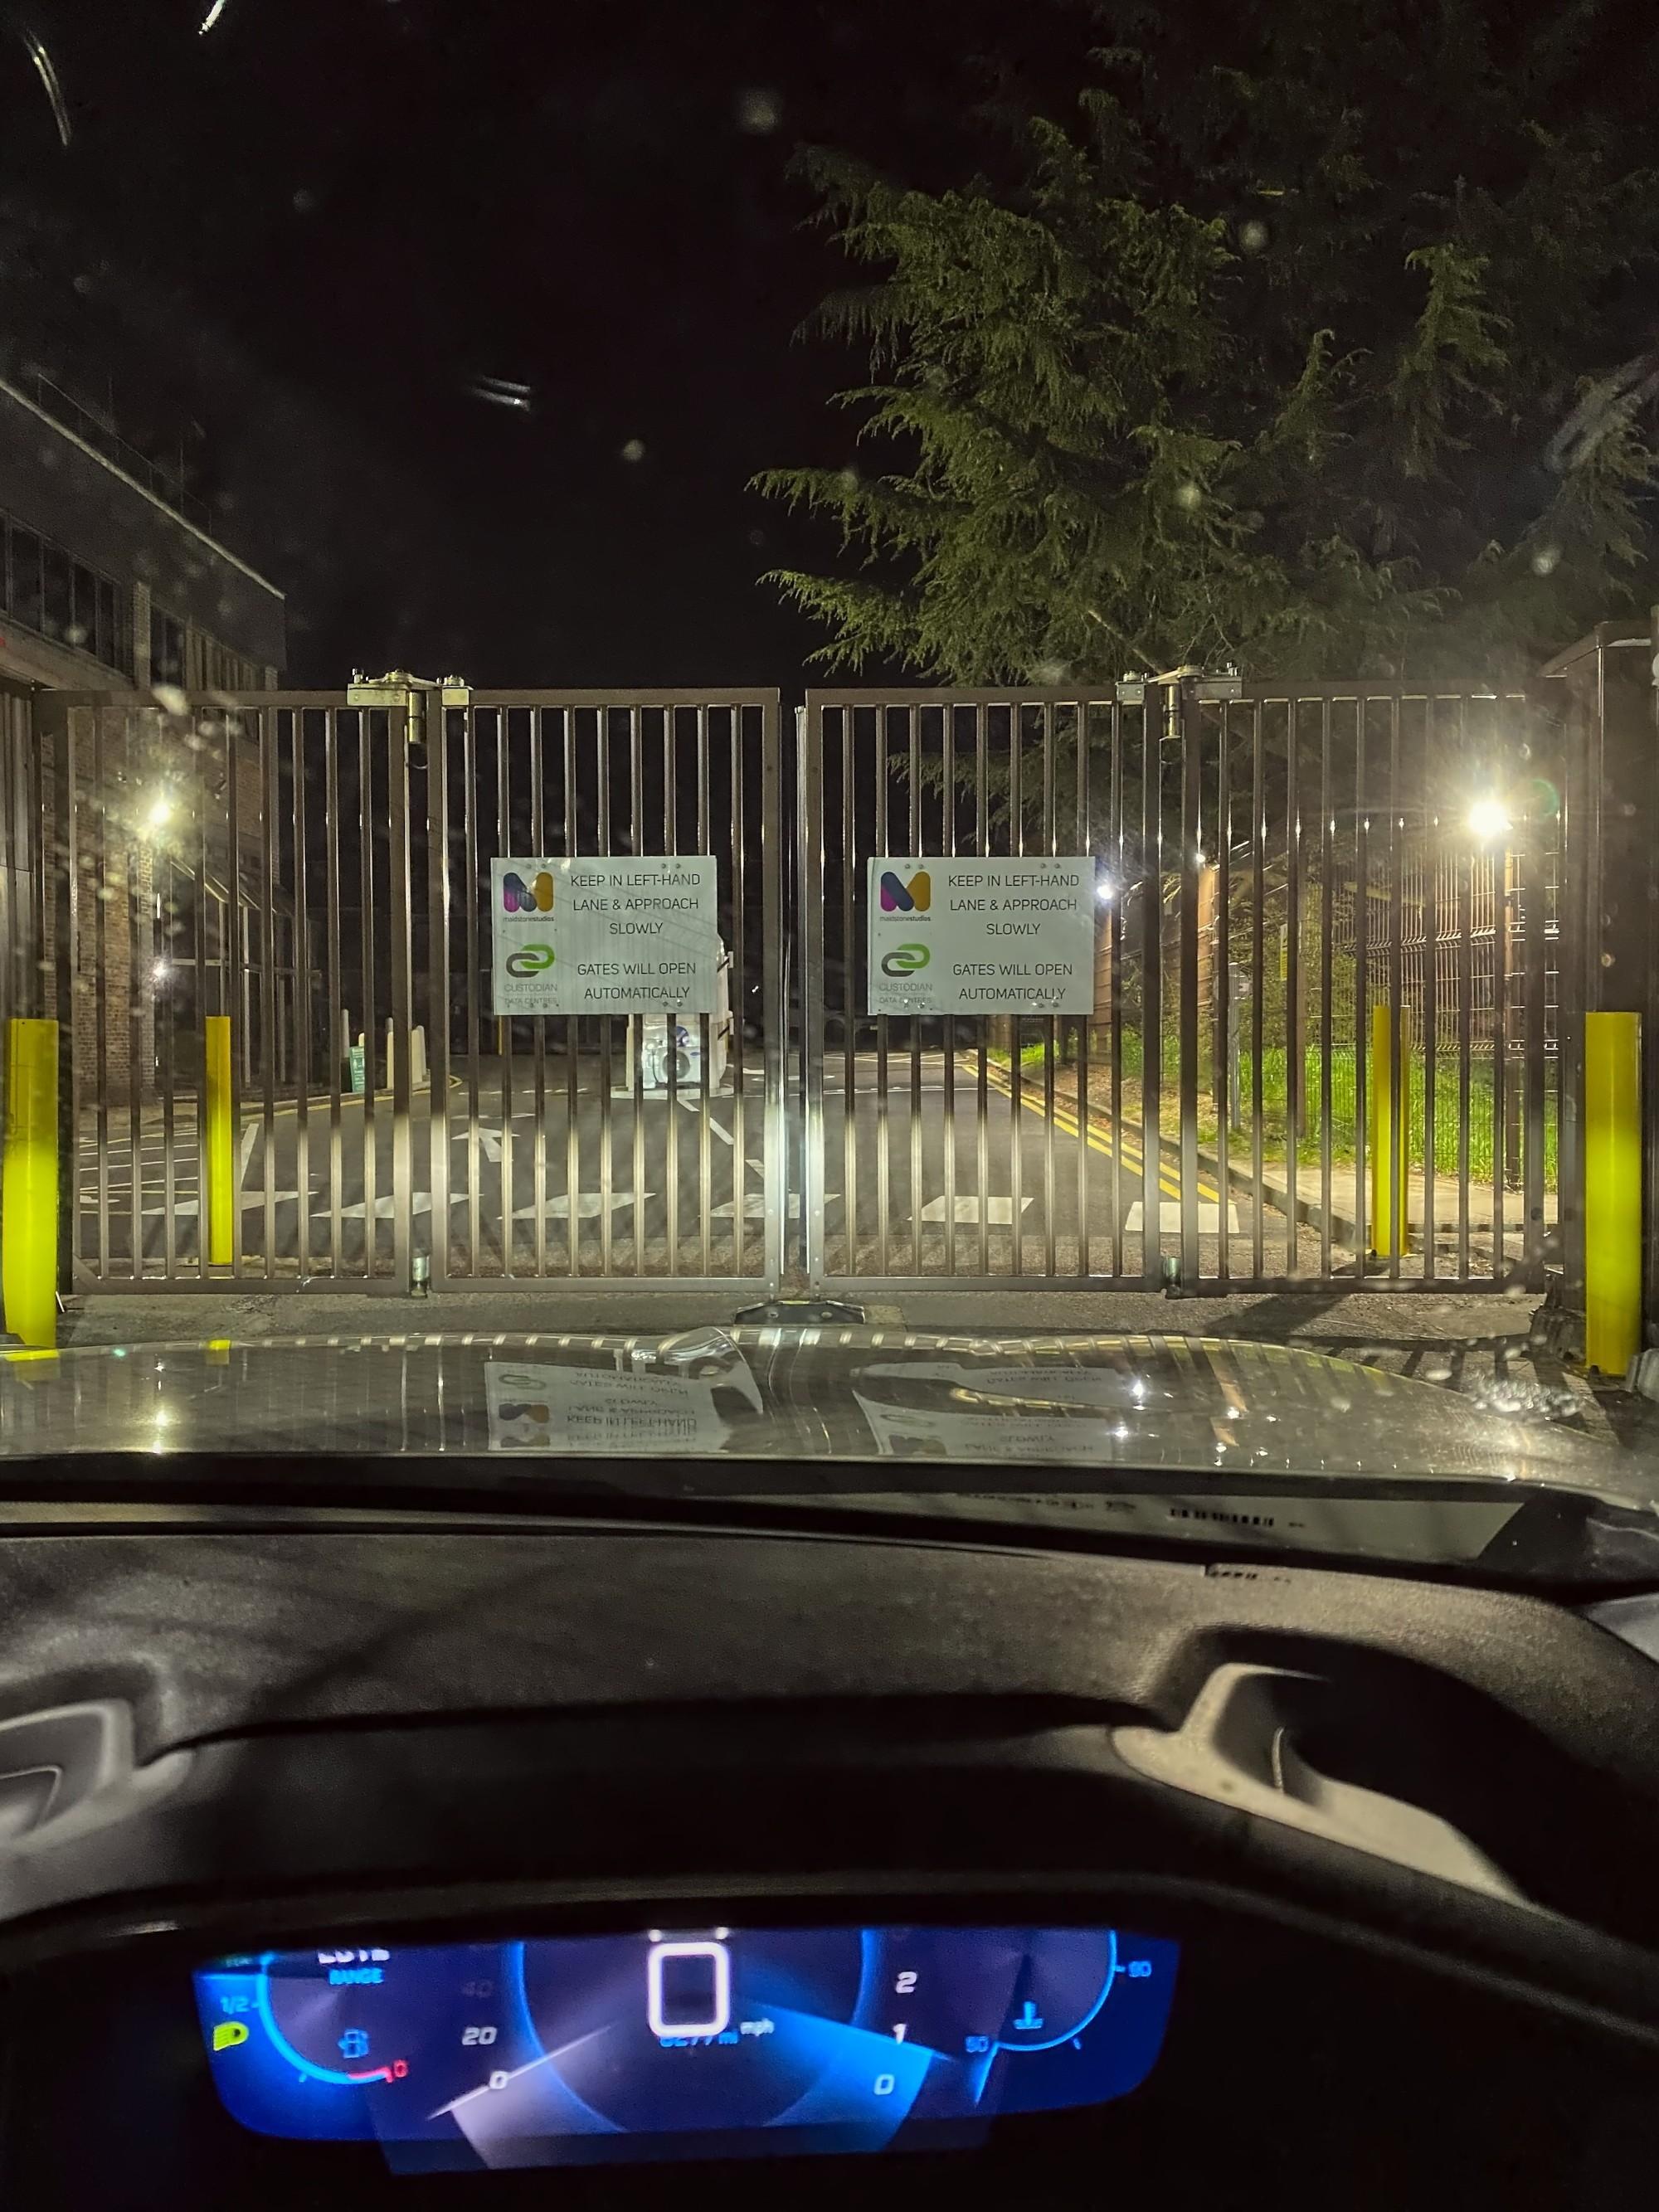 arriving at the CustodianDC data center